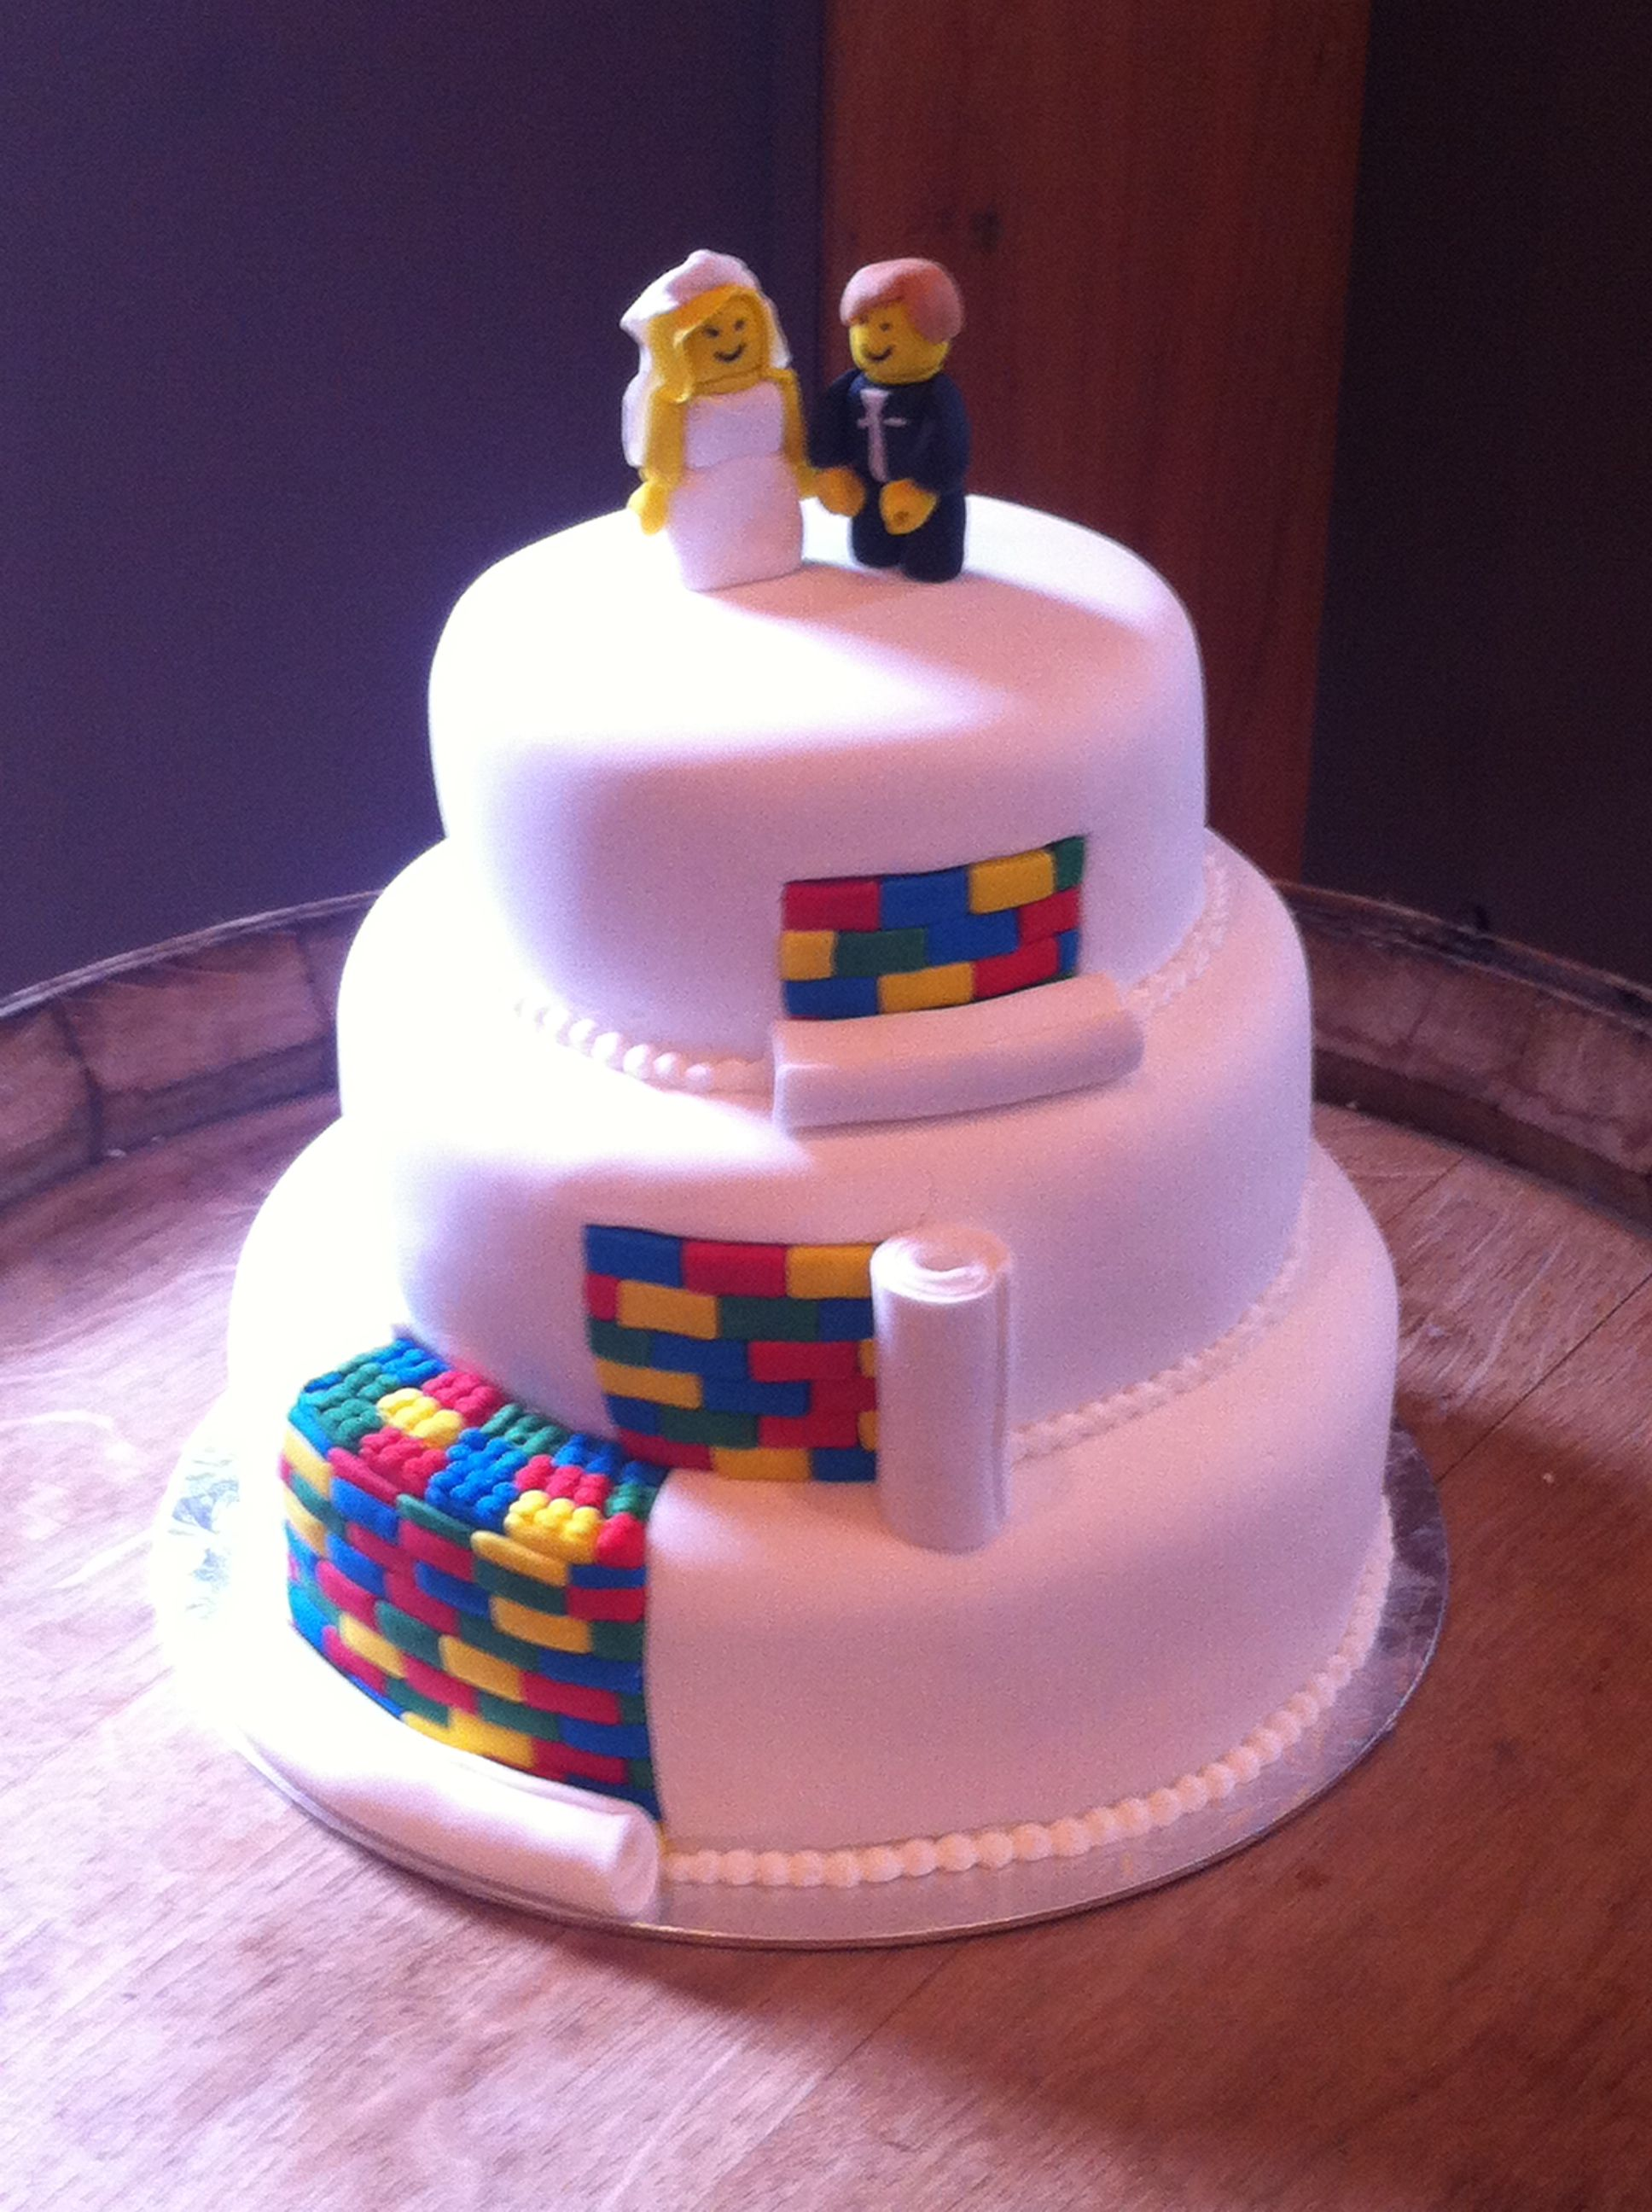 Lego Wedding Cake Tiers of Love Christchurch | Wedding | Pinterest ...